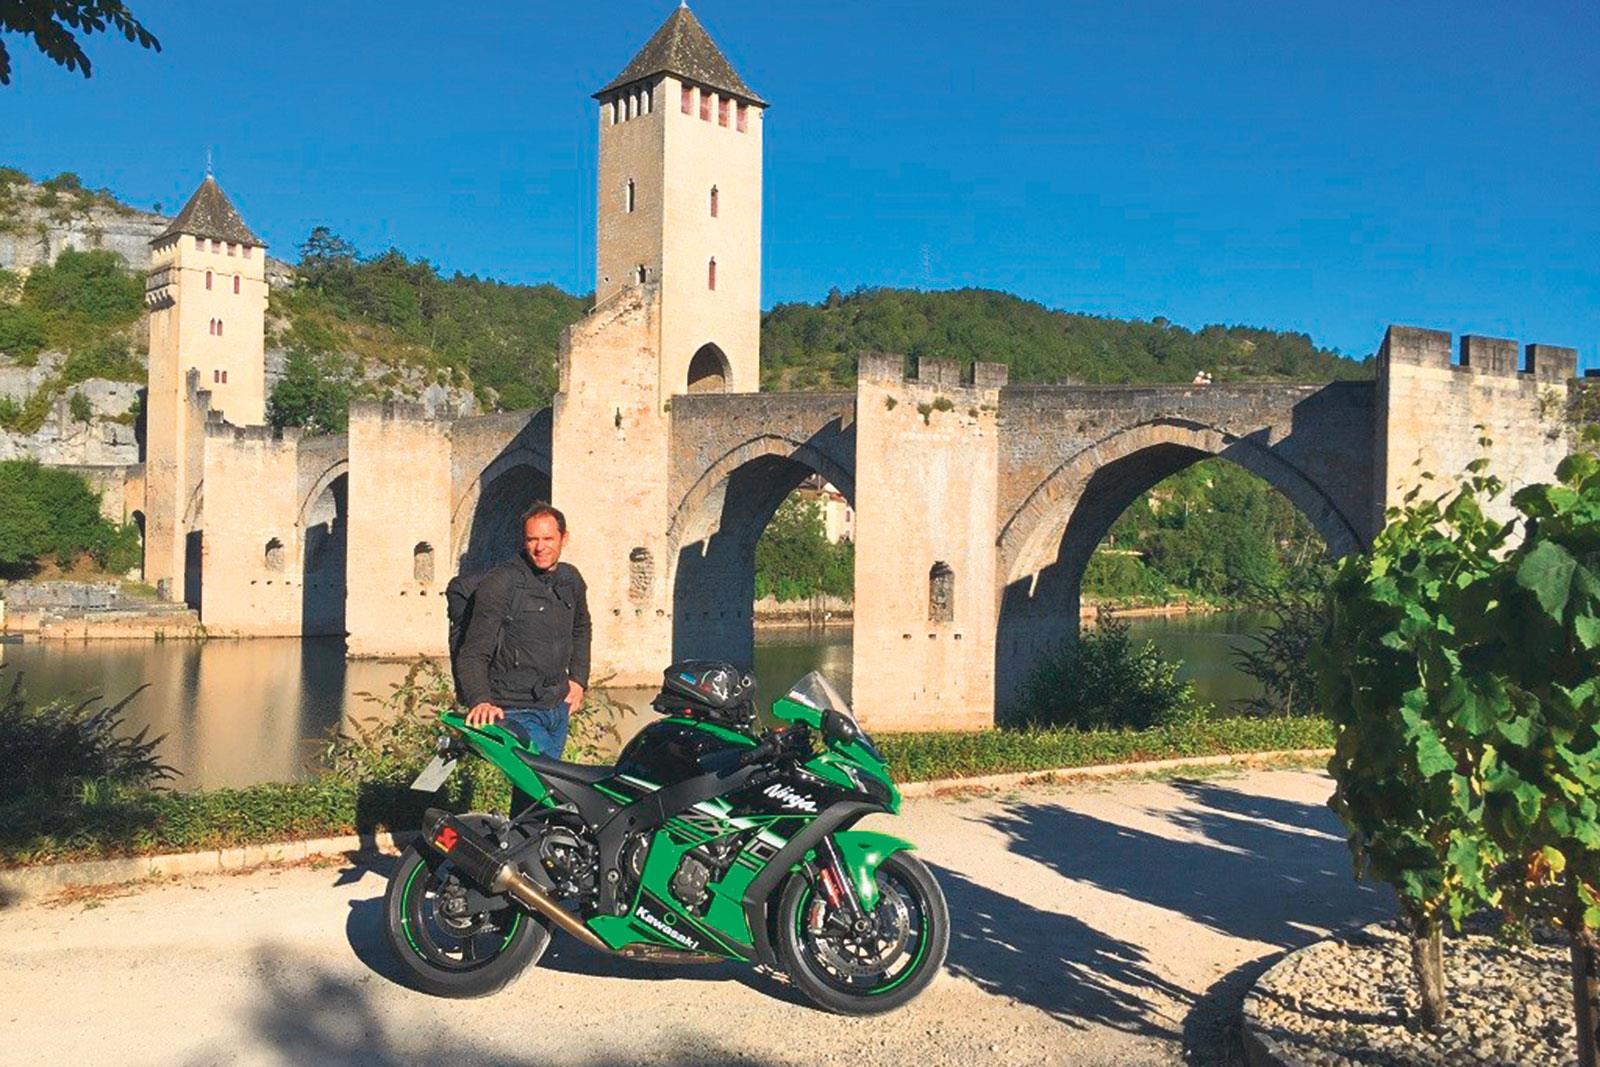 Kawasaki ZX-10R #ride5000miles